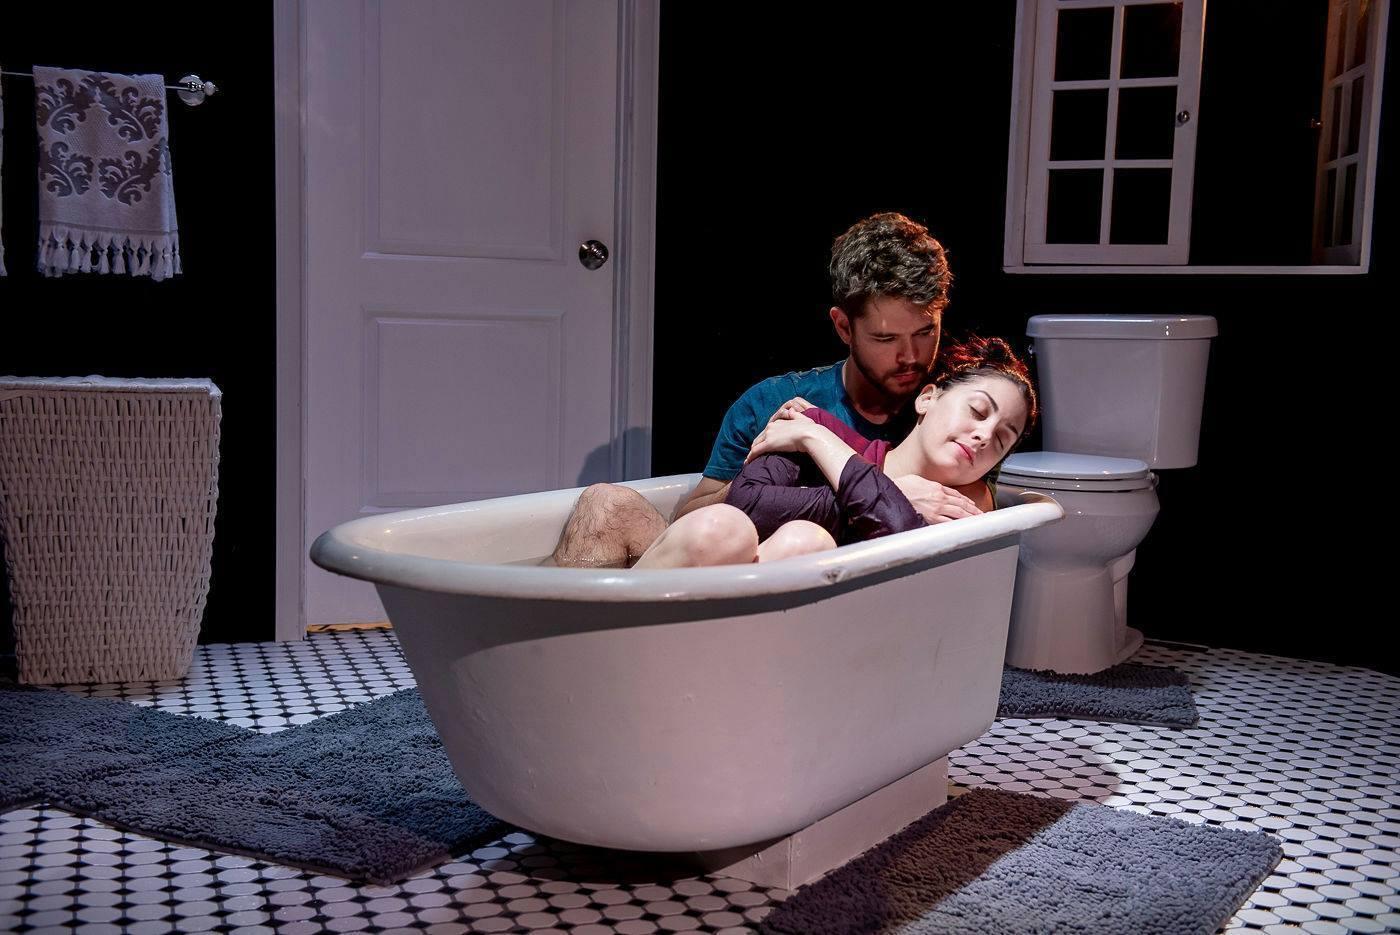 BWW Review: HARLOWE at FAU Theatre Lab